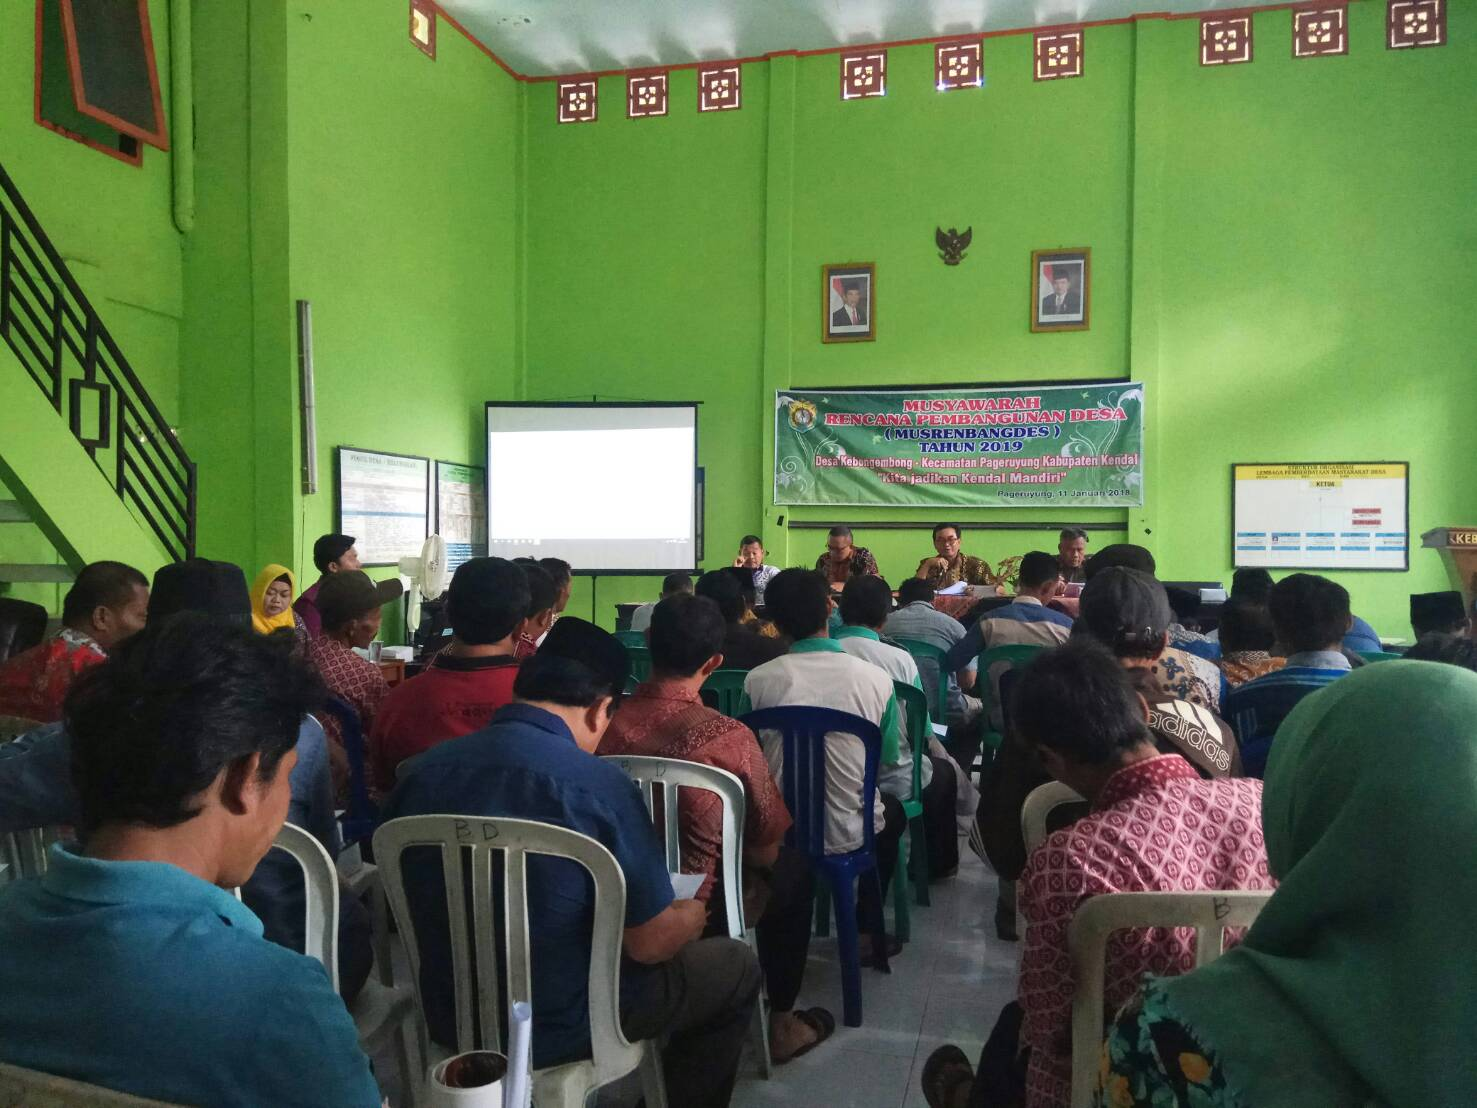 Musyawarah Rencana Pembangunan Desa (MUSRENBANGDES) Kebon Gembong